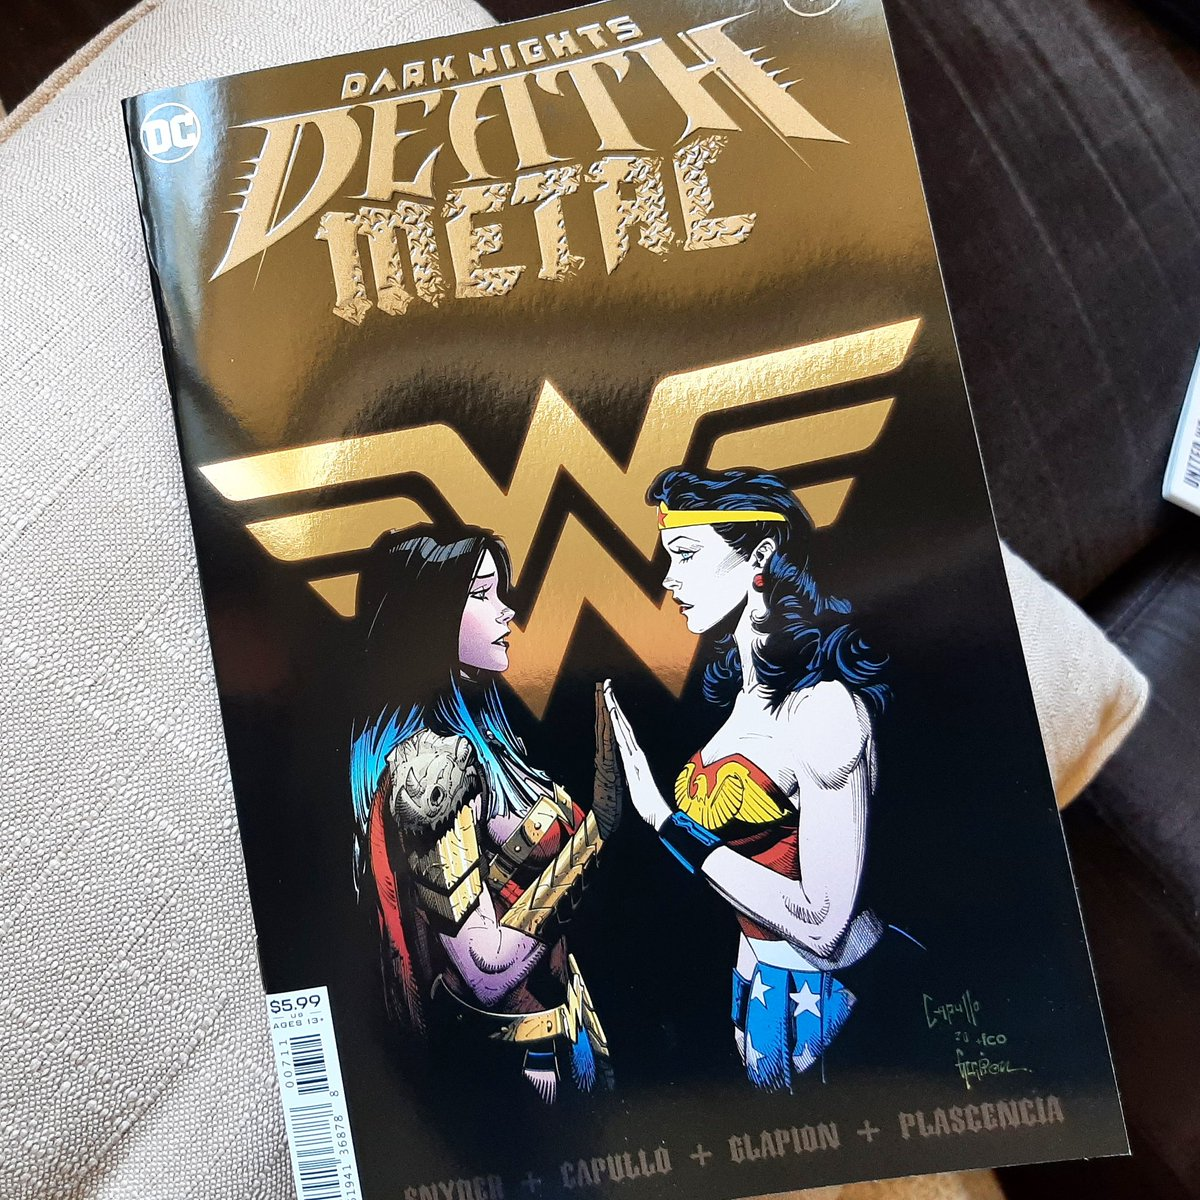 😭😭😍😍 #WonderWoman #DC #DarkNightsDeathMetal #DCComics #ScottSnyder #GregCapullo #JonathanGlapion #FCOPlascencia #JusticeLeague ❤💛💙